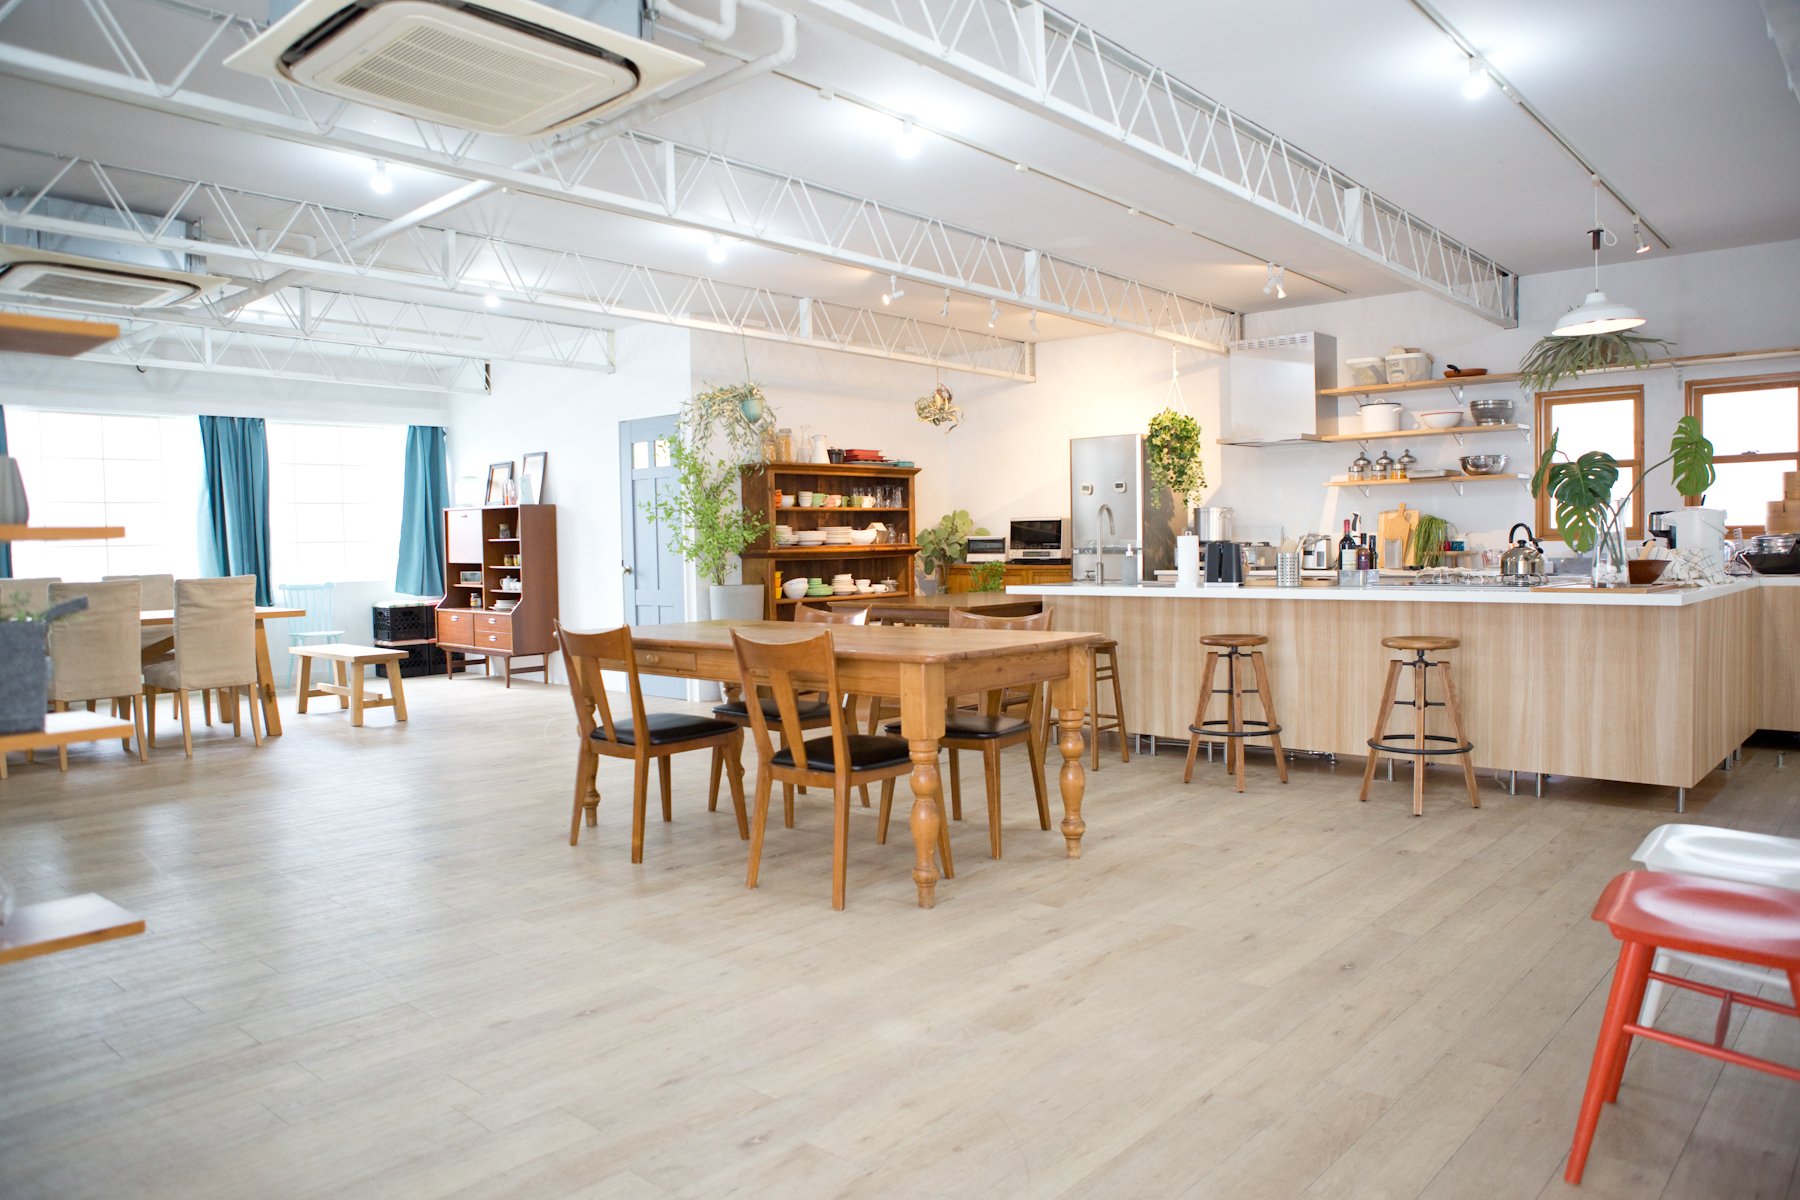 studio Licorne 野毛 (スタジオリコルネ)キッチンの背景変更可能(背景変更可)